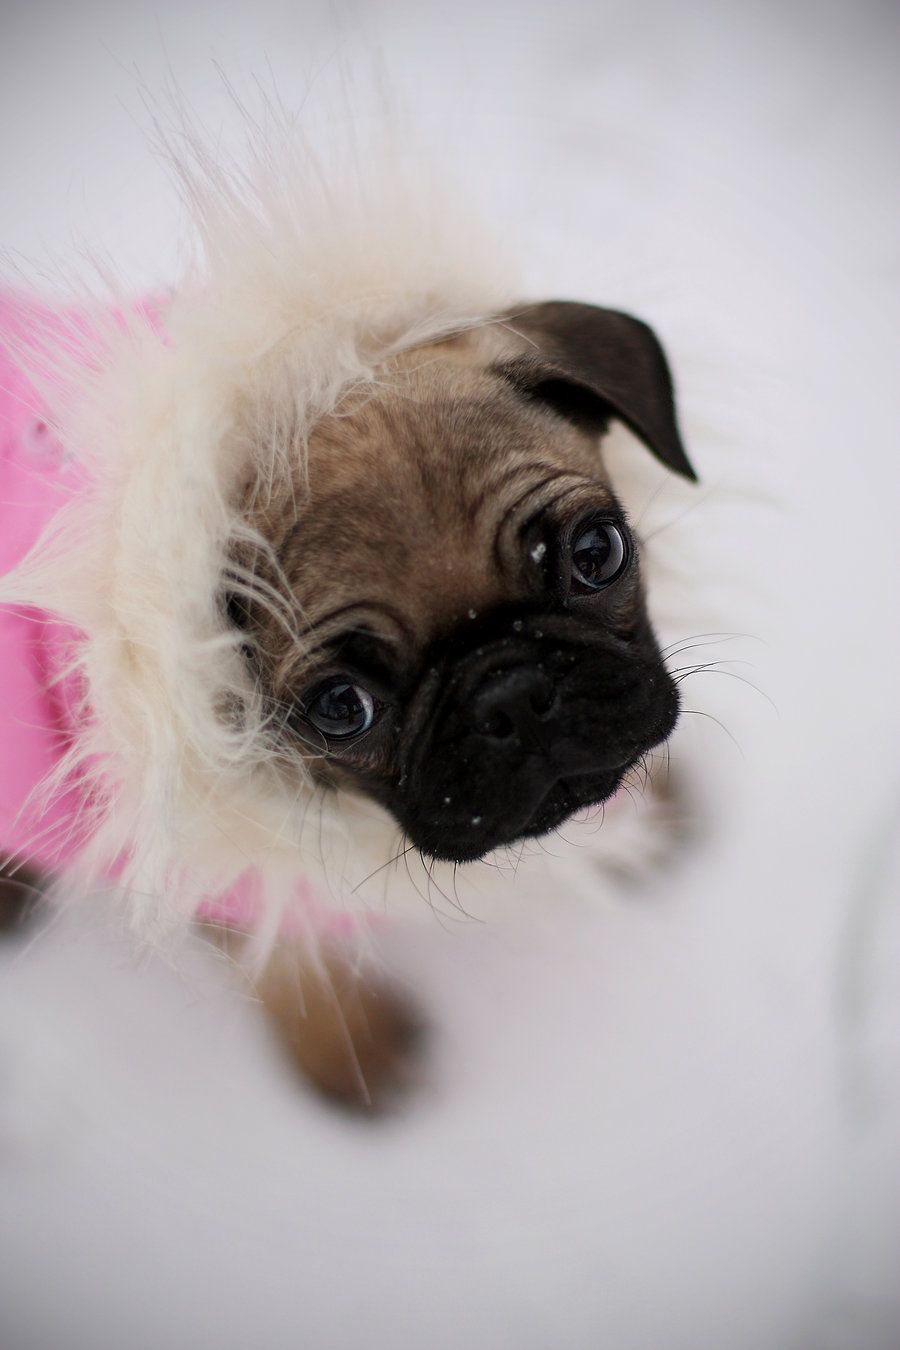 pug wallpaper, screensaver, background cute pug puppy   pug